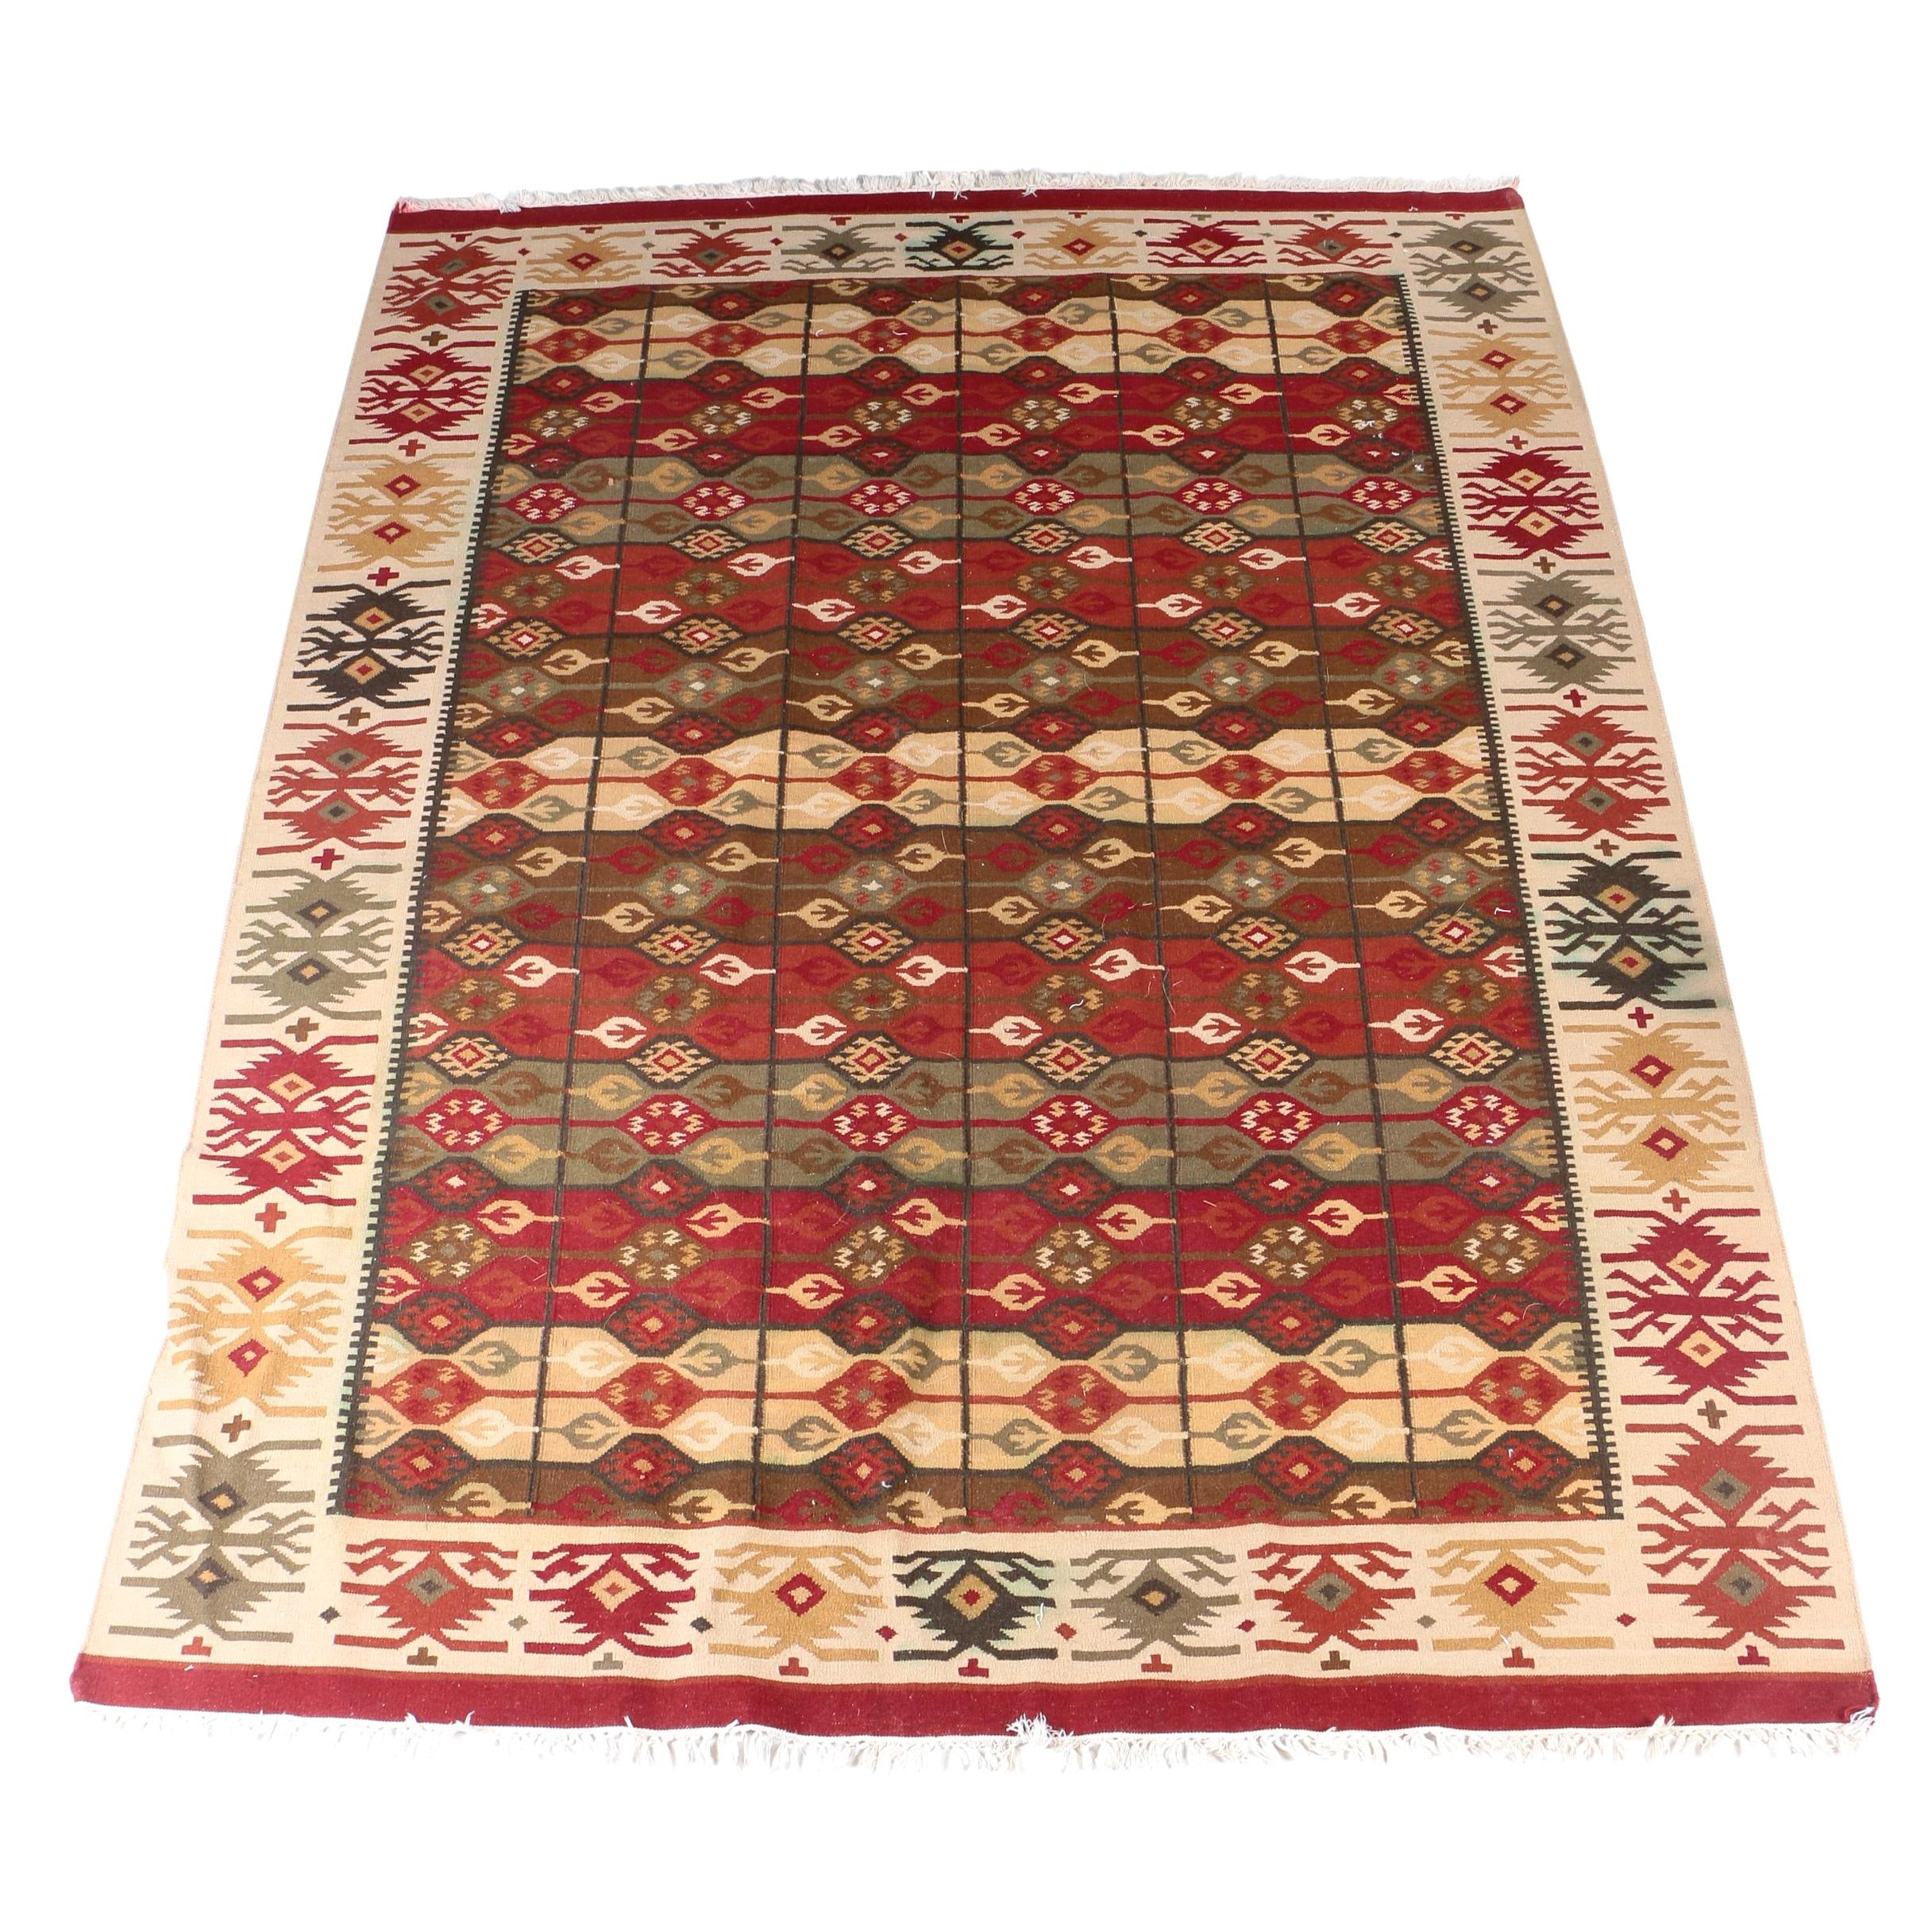 Handwoven Romanian Bessarabian Kilim Wool Area Rug